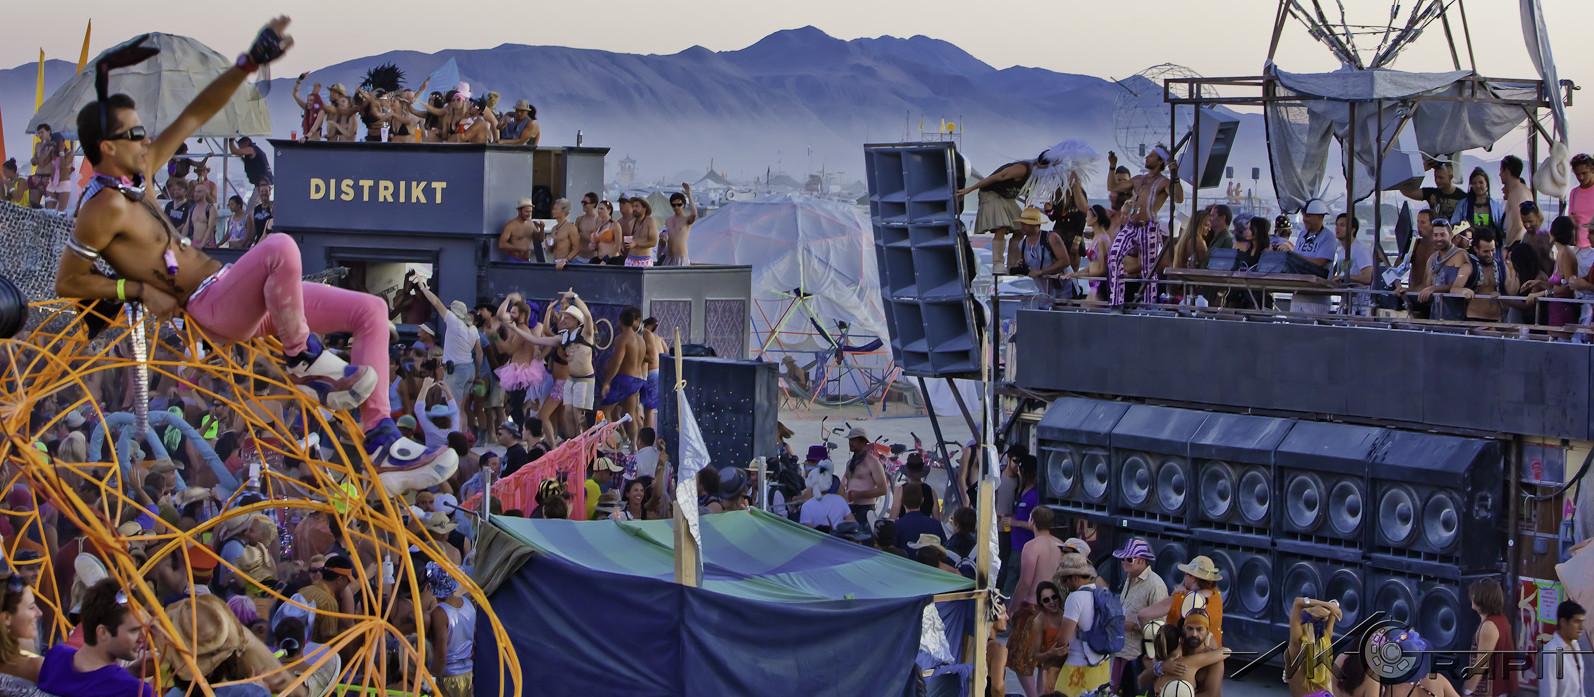 The Music of Burning Man Documentary